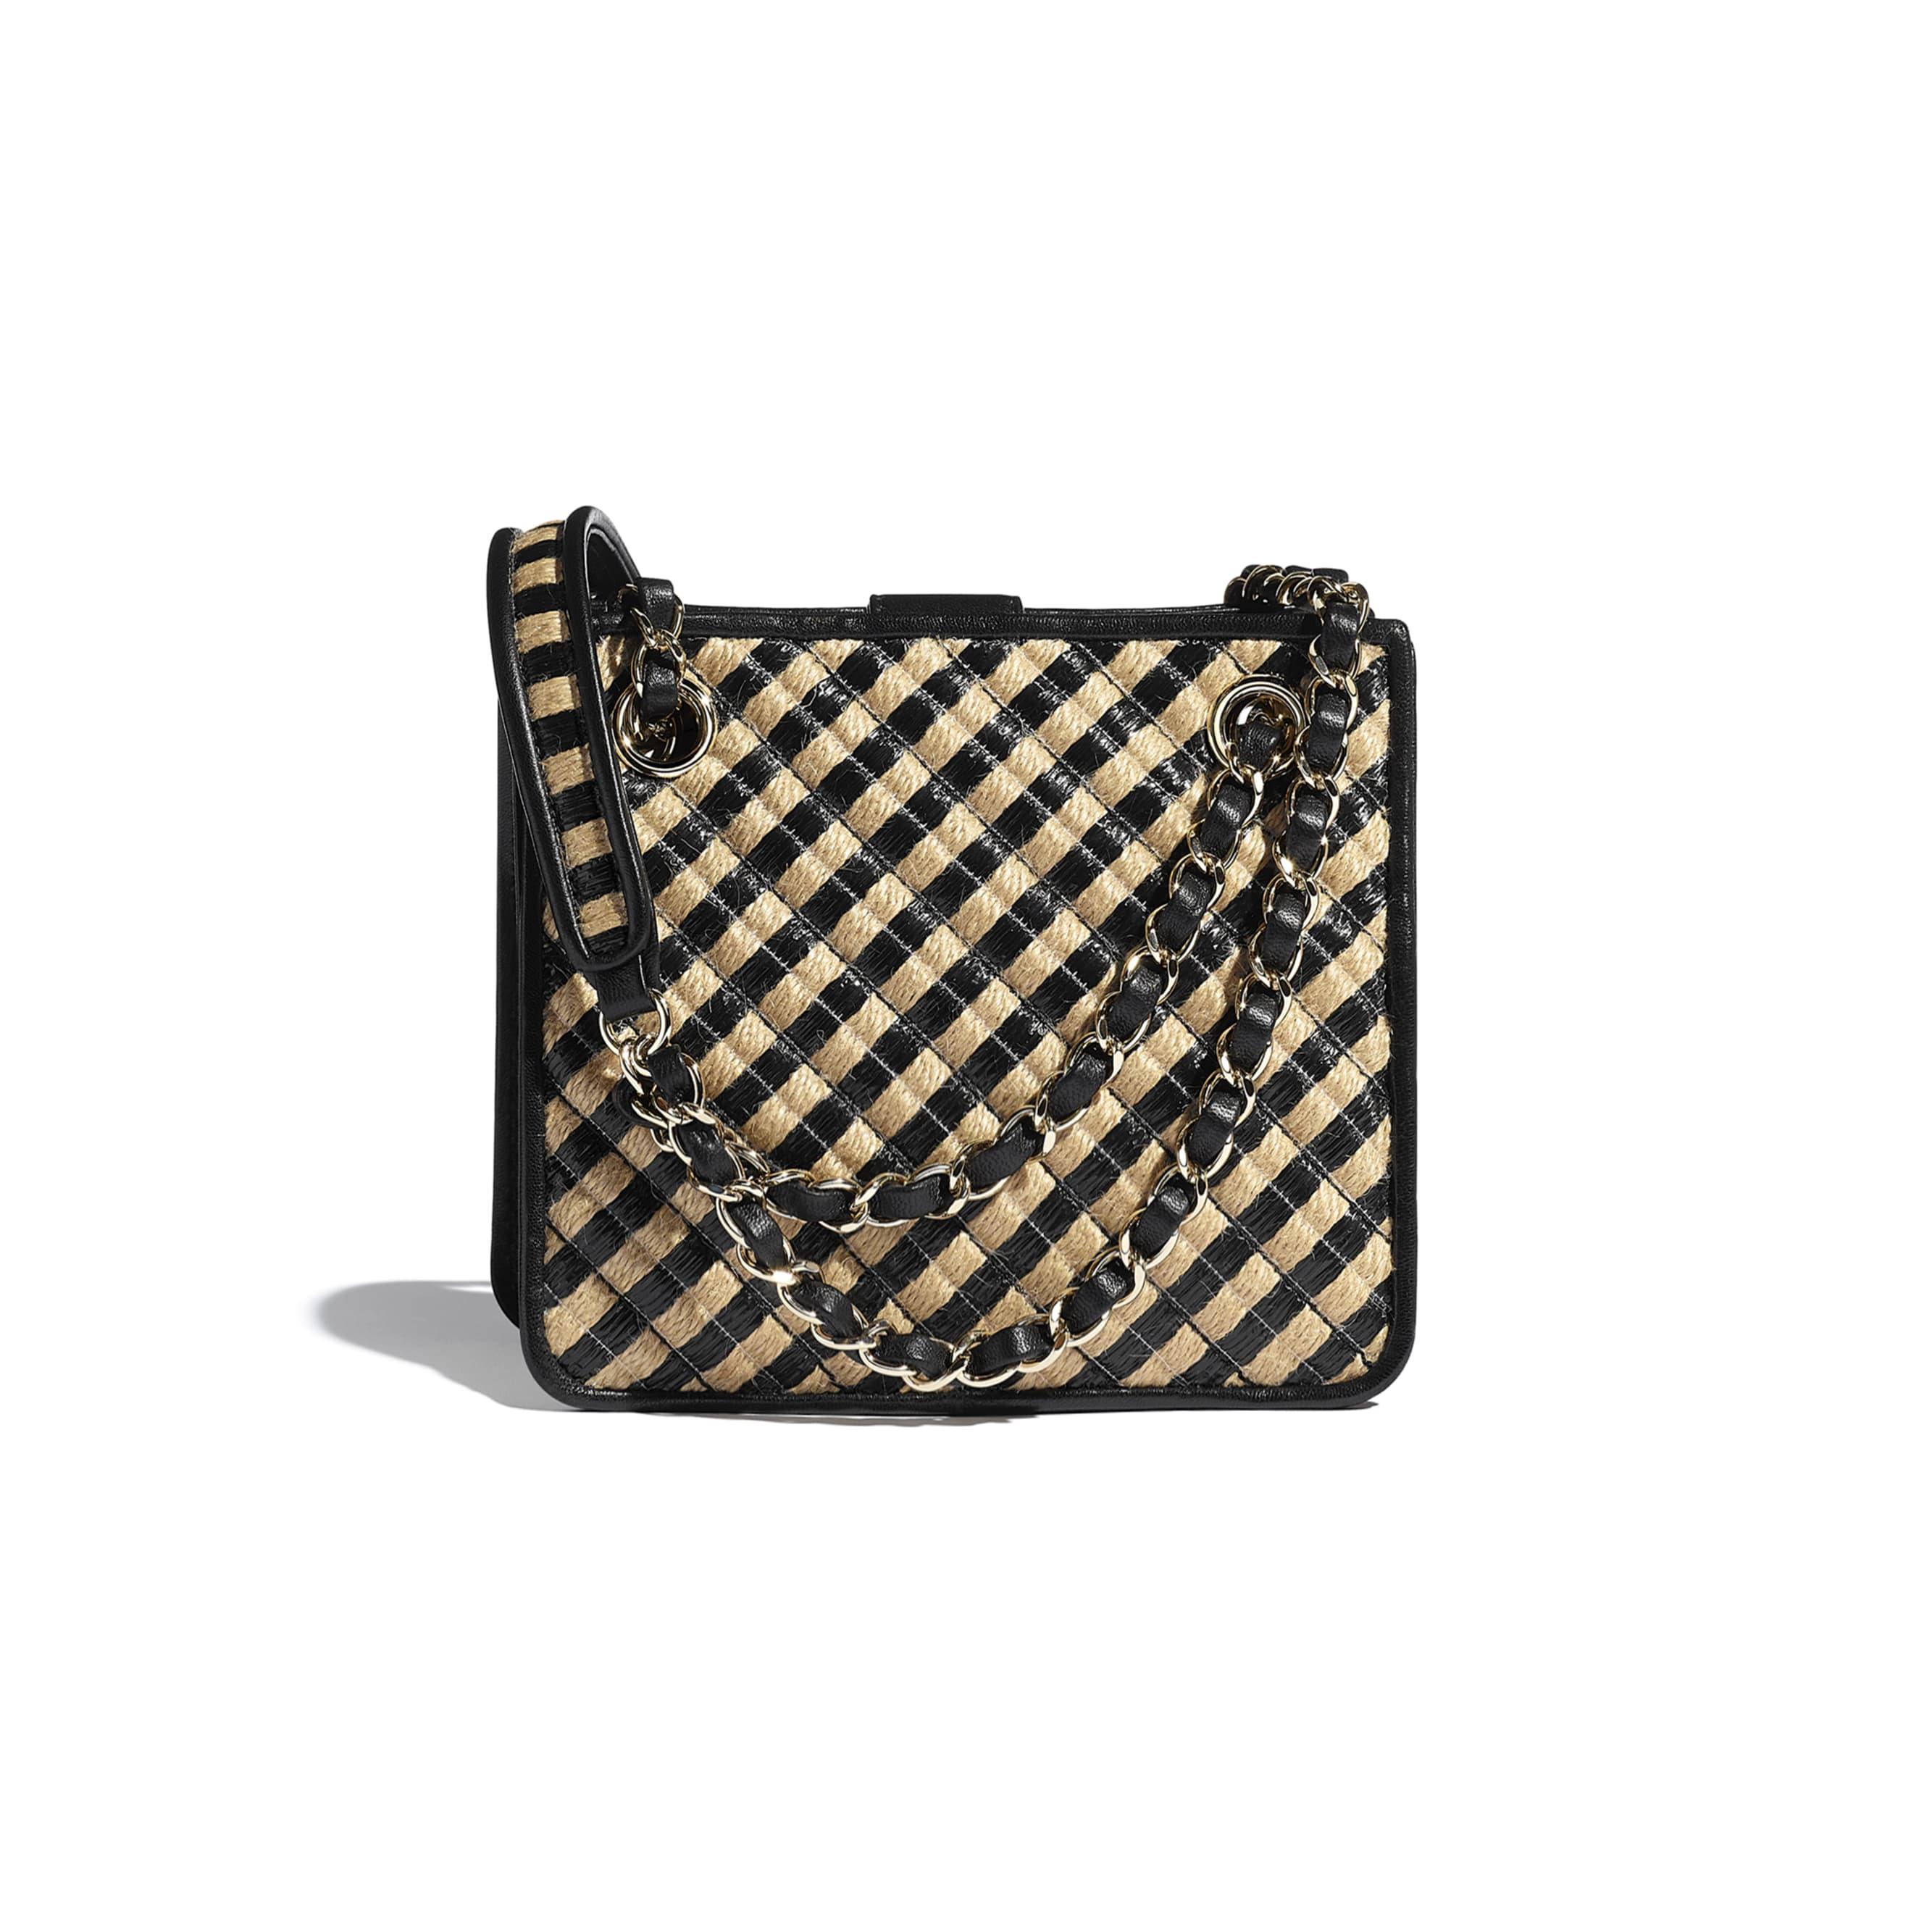 Drawstring Bag - Black & Beige - Raffia, Jute Thread & Gold-Tone Metal - CHANEL - Alternative view - see standard sized version